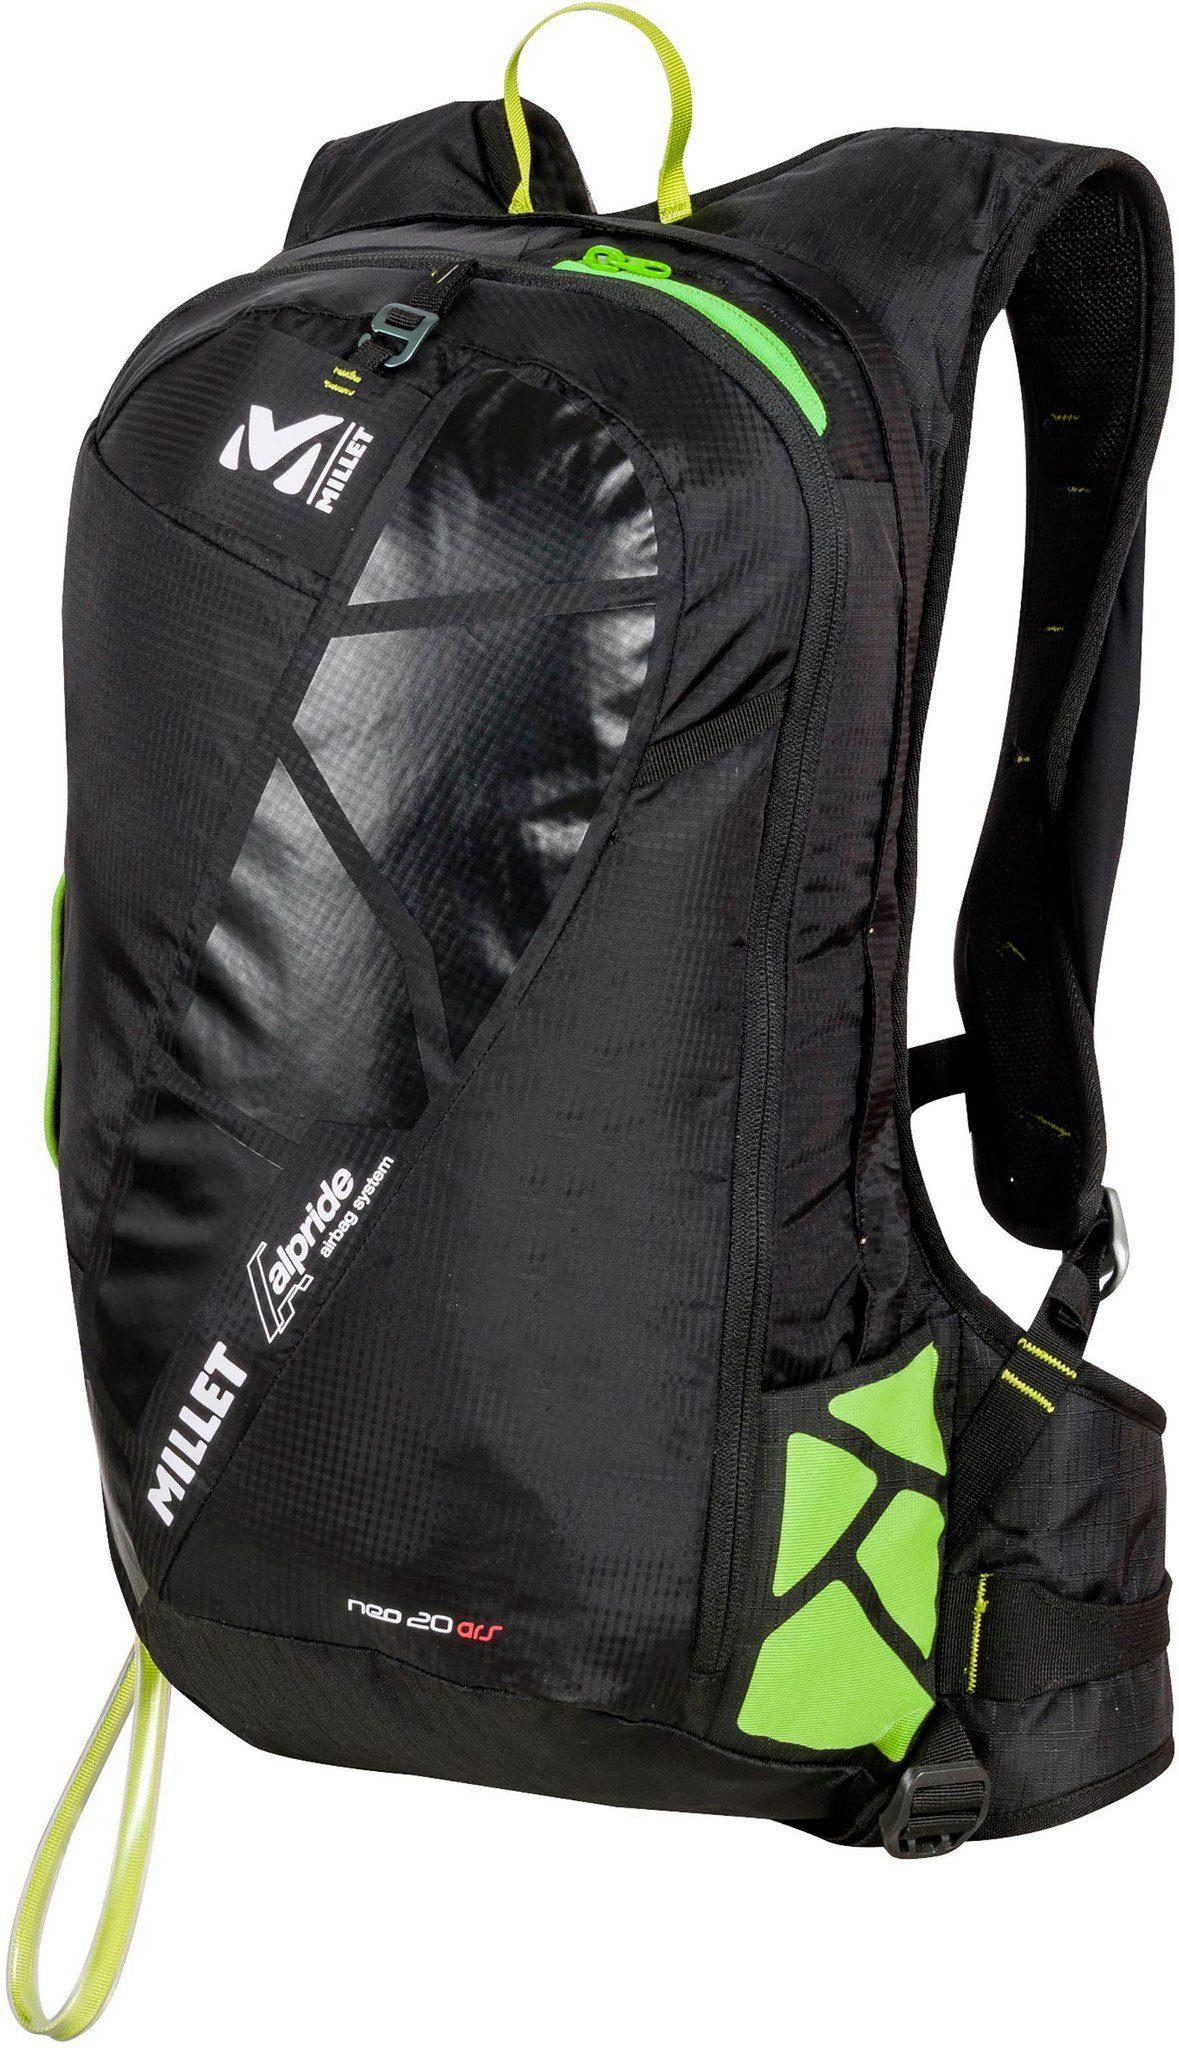 Millet Lawinenrucksack »Neo 20 ARS Backpack«